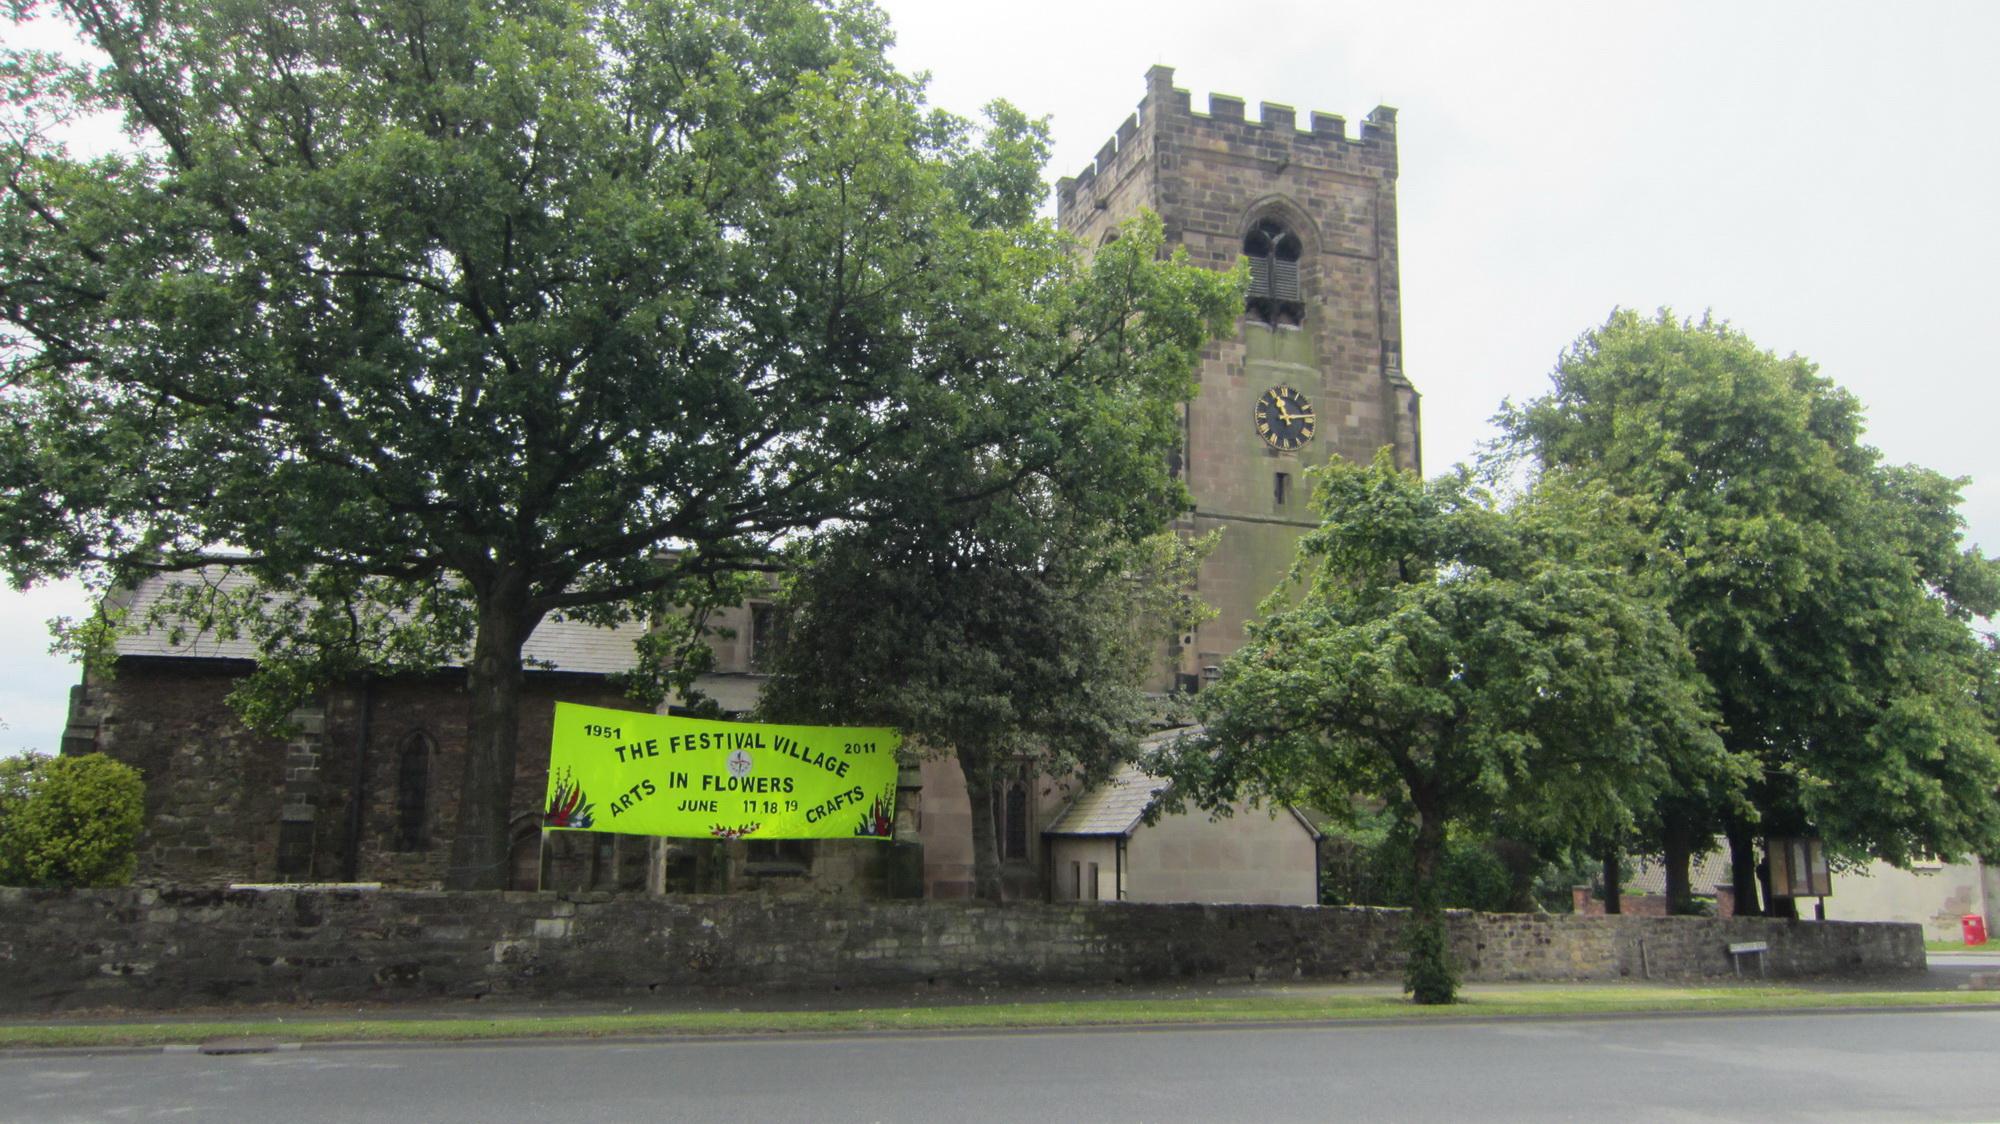 st-helens-church-june-17th-2011